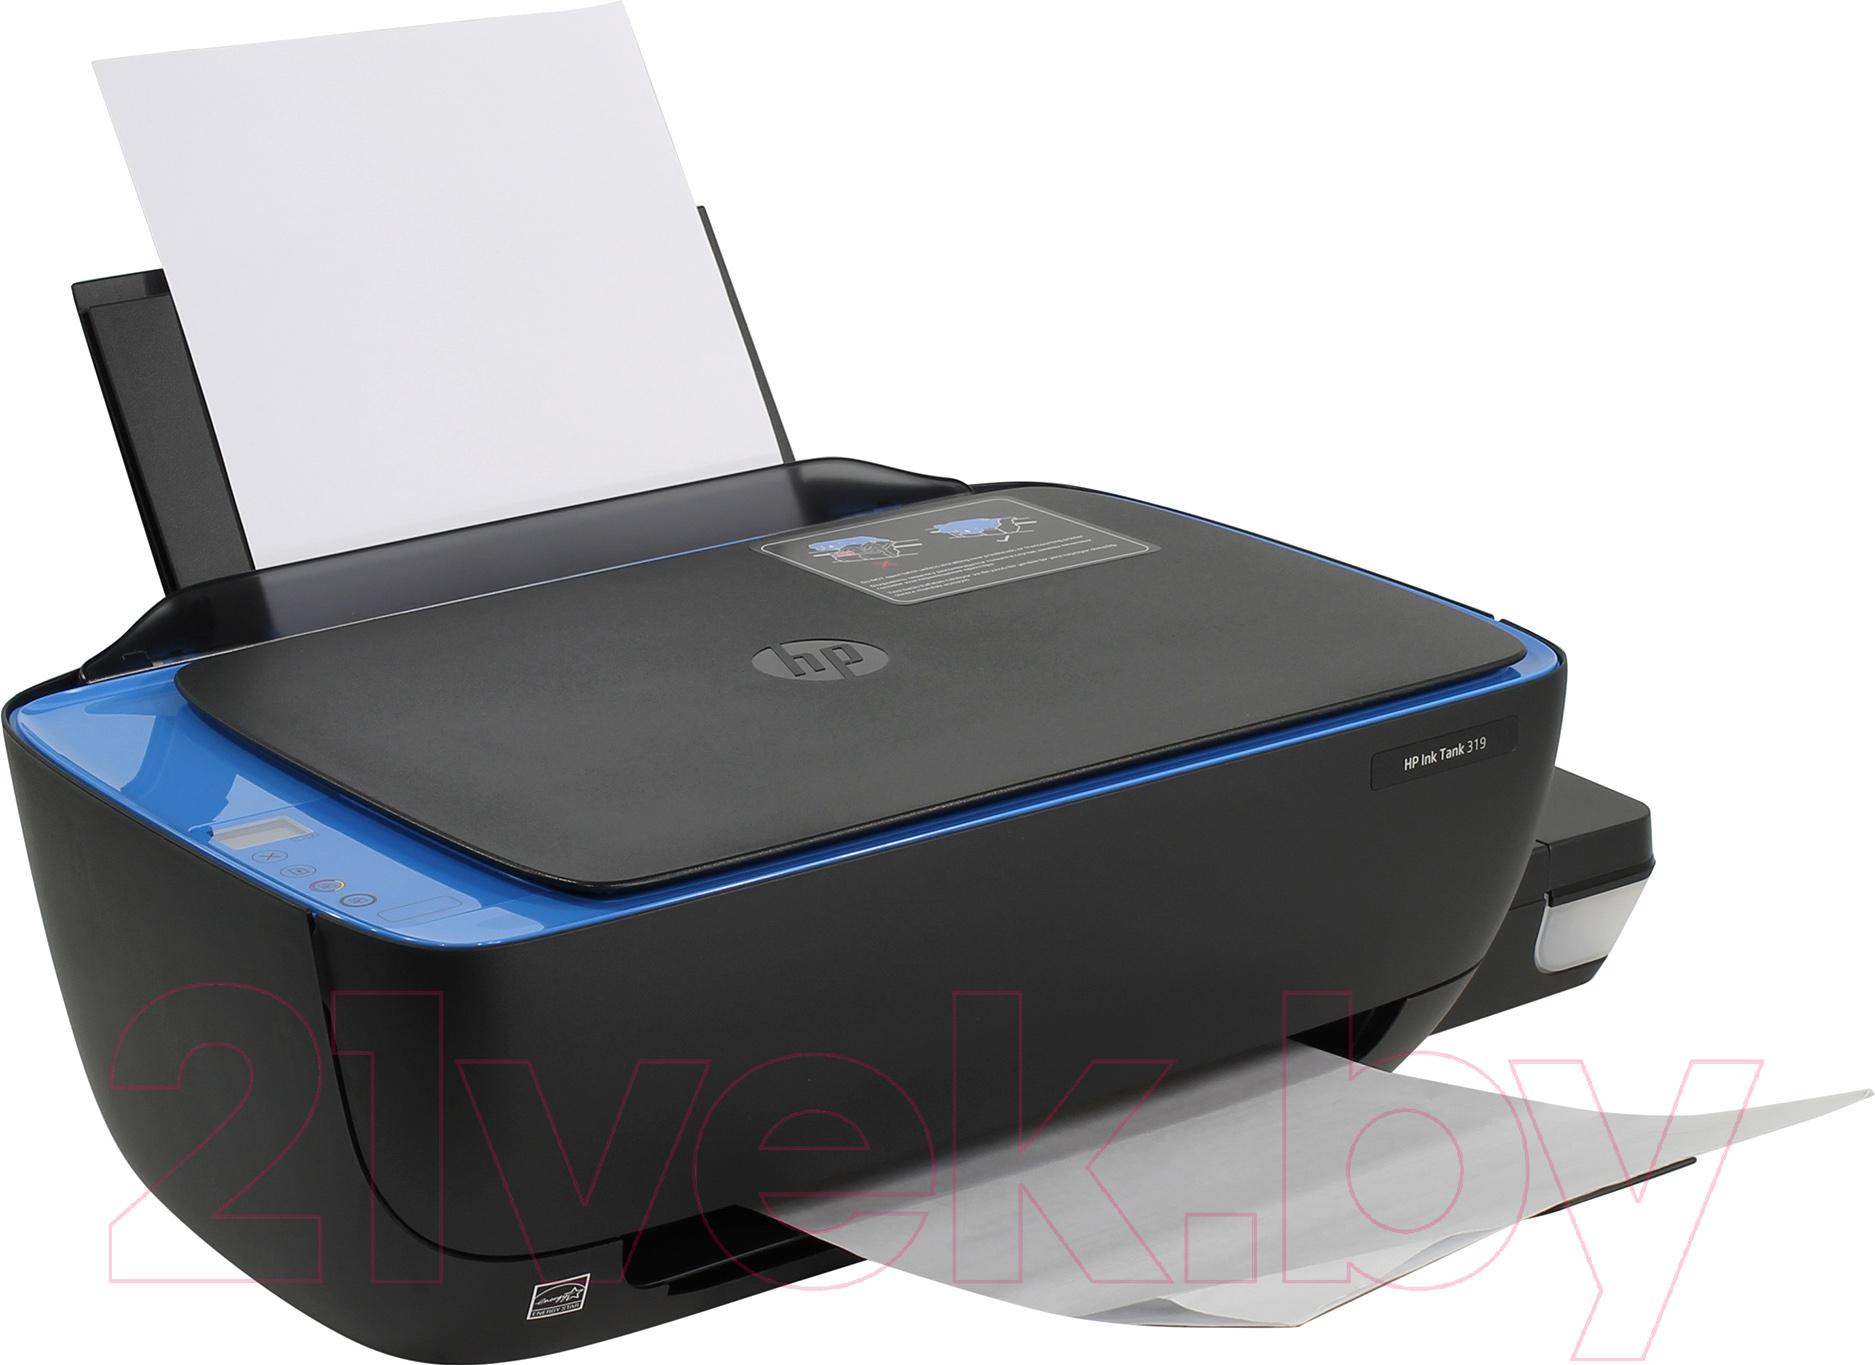 Купить МФУ HP, Ink Tank Wireless 419 (Z6Z97A), Китай